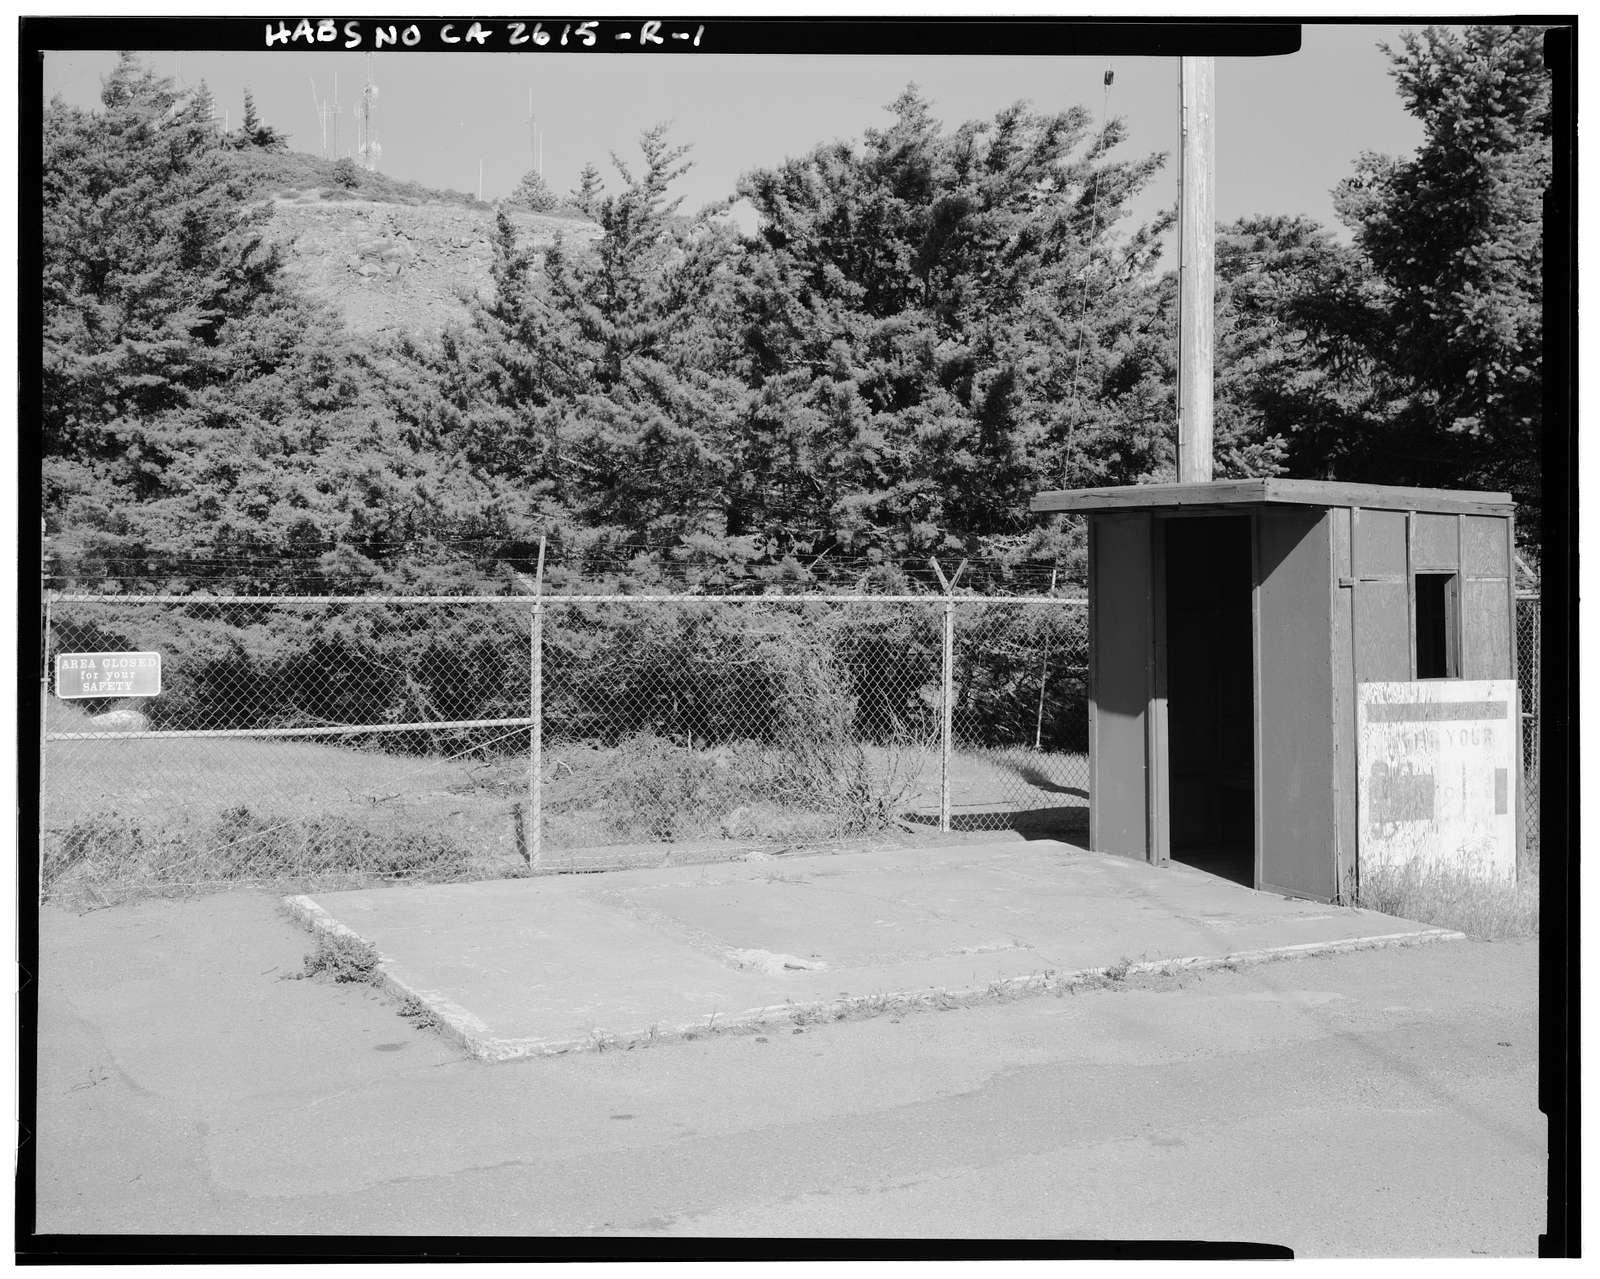 Mill Valley Air Force Station, Gatehouse, East Ridgecrest Boulevard, Mount Tamalpais, Mill Valley, Marin County, CA